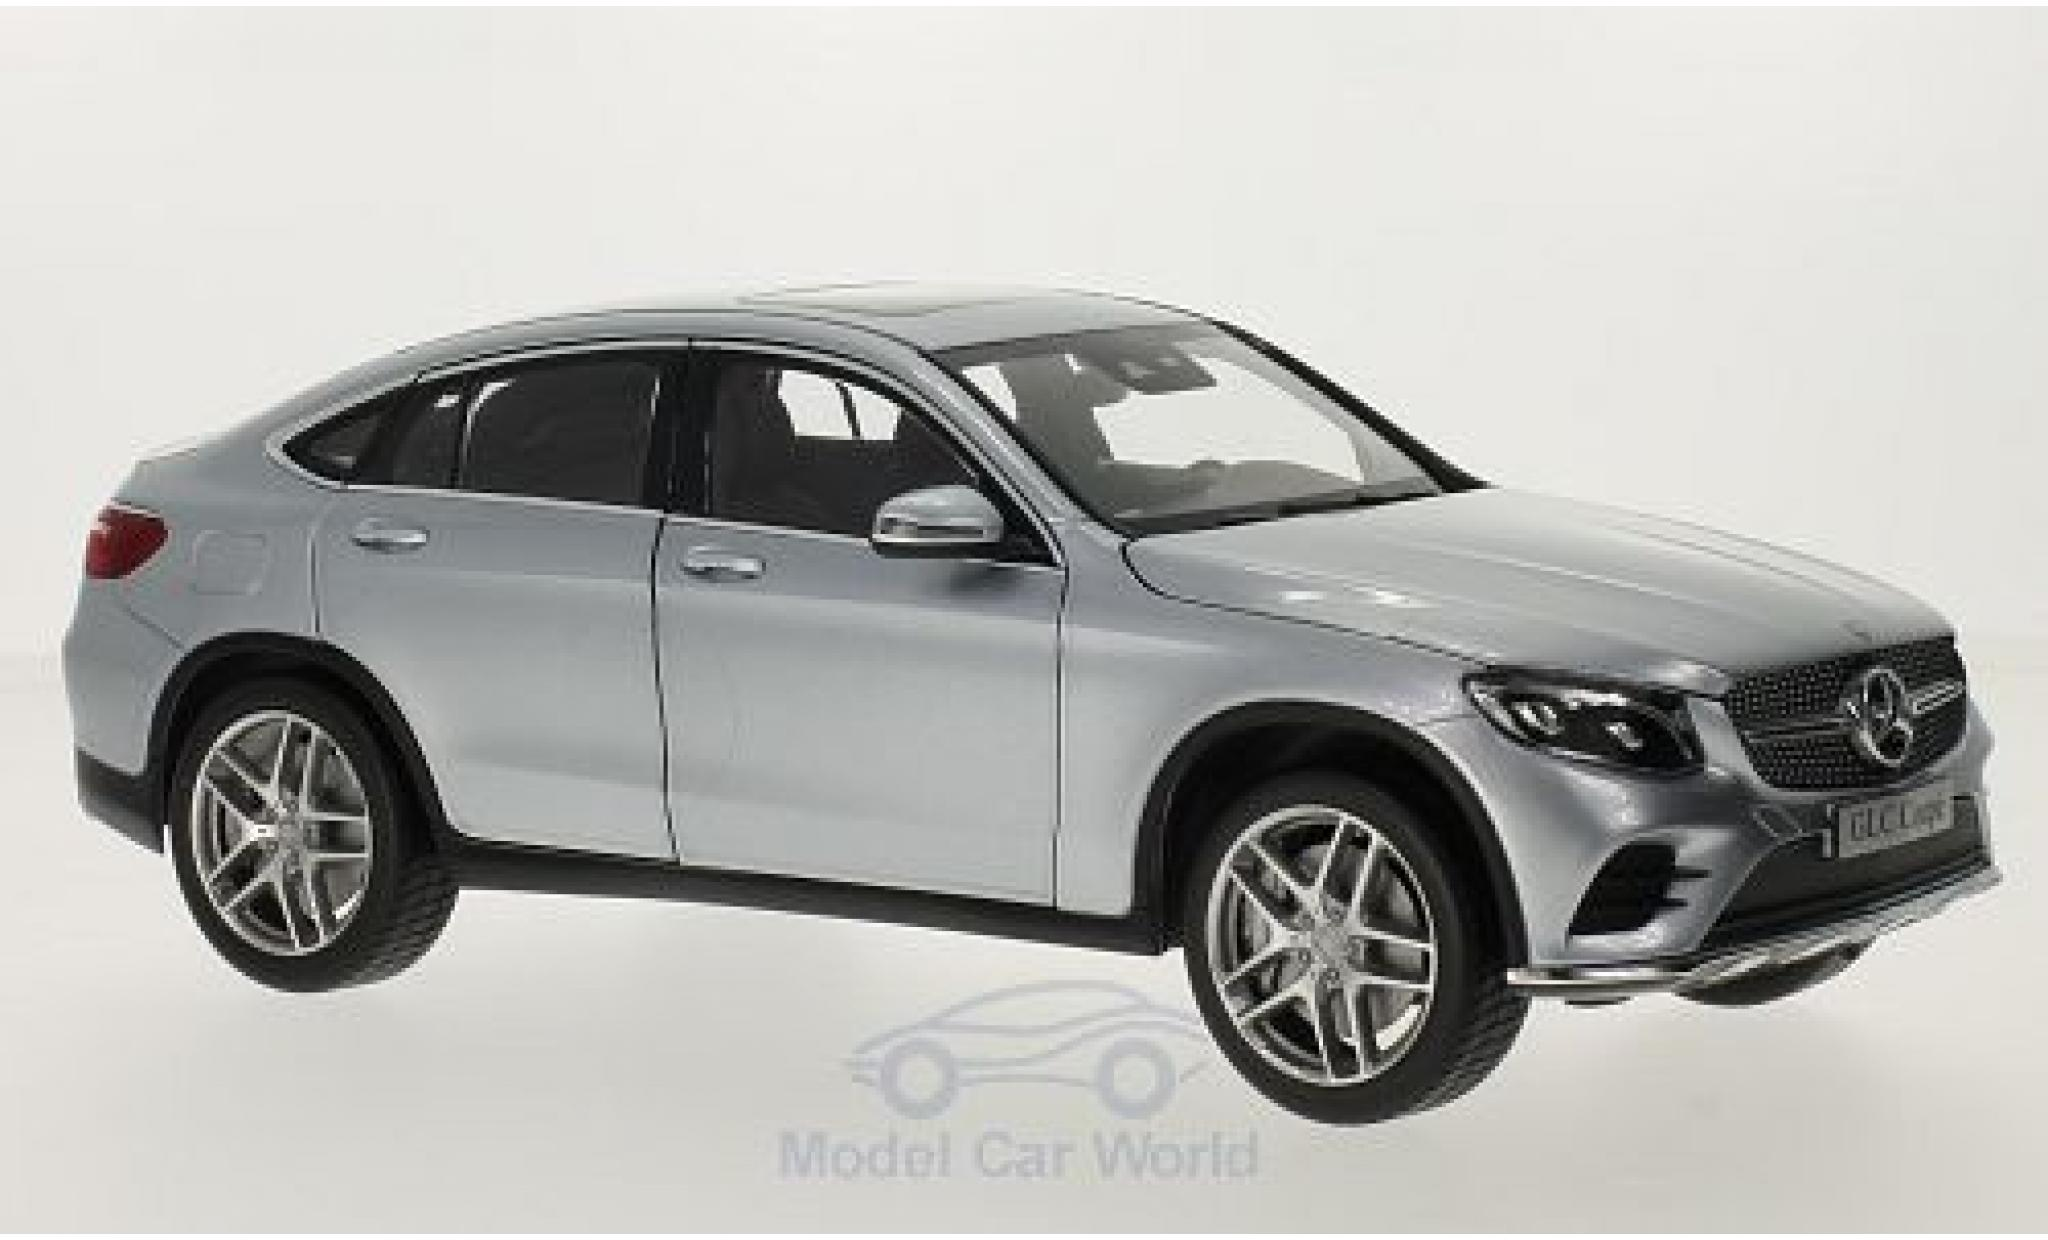 Mercedes Classe GLC 1/18 iScale GLC Coupe (C253) grise